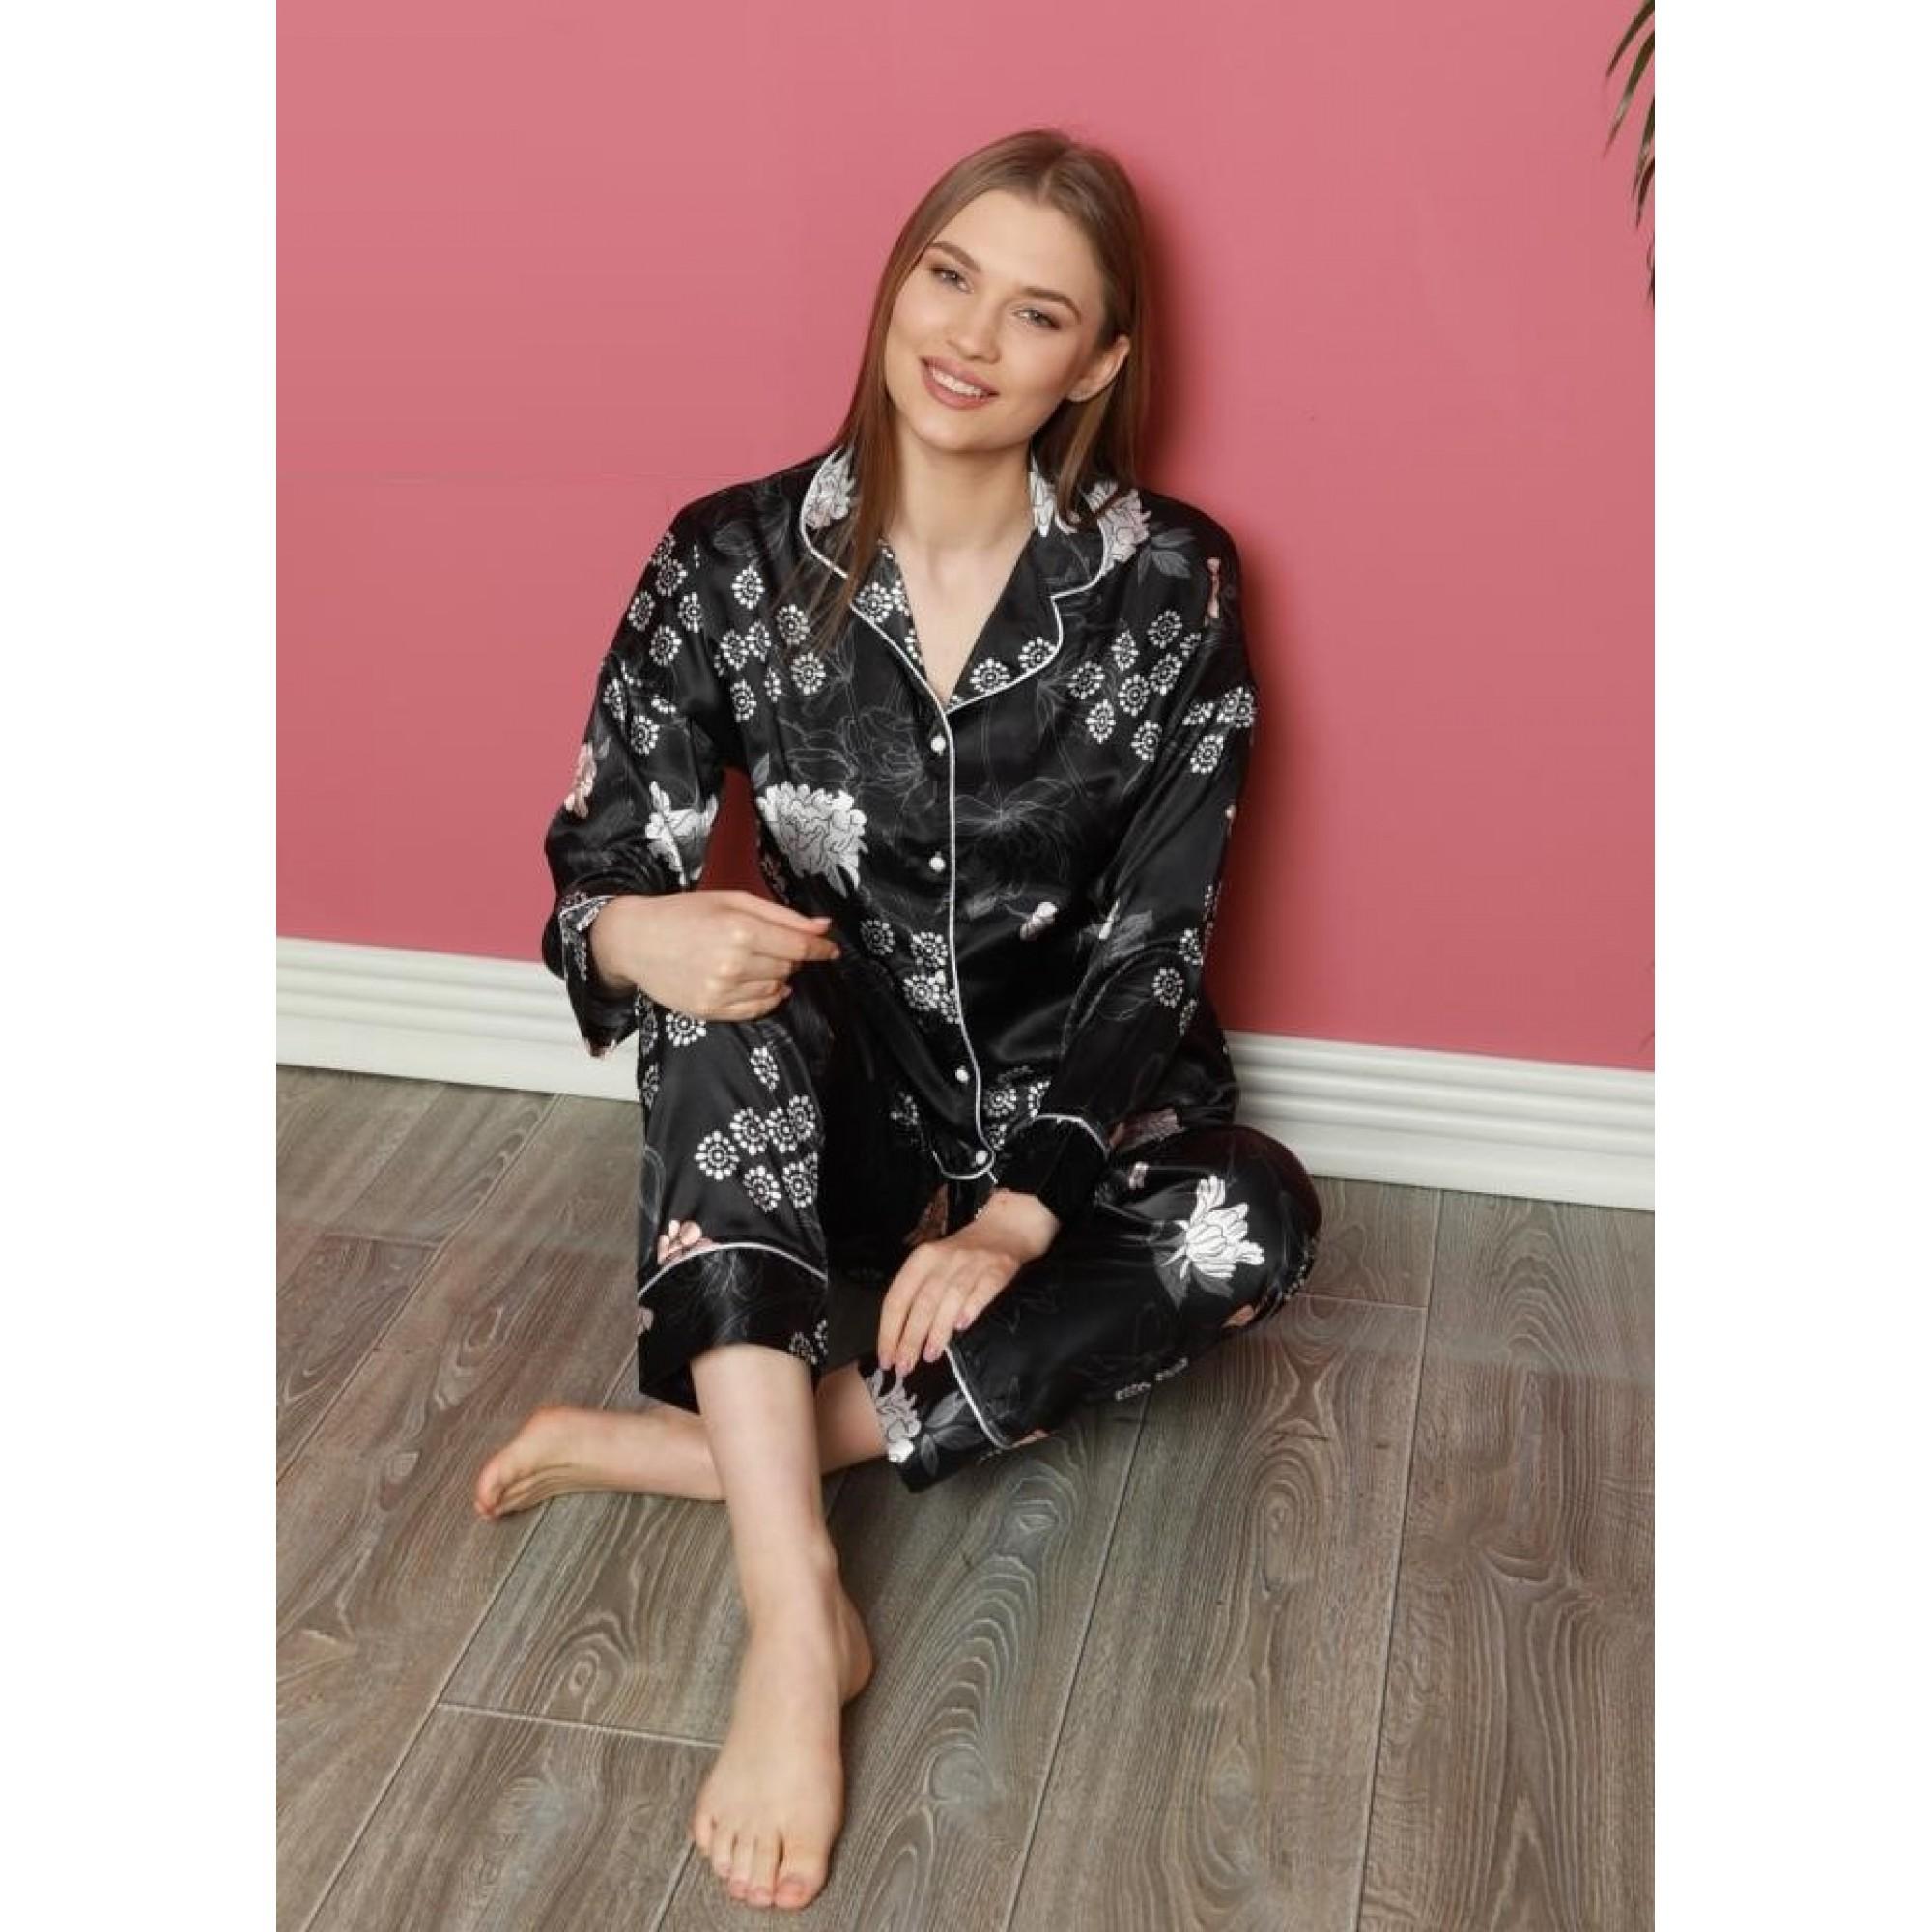 Annika луксозна сатенена пижама